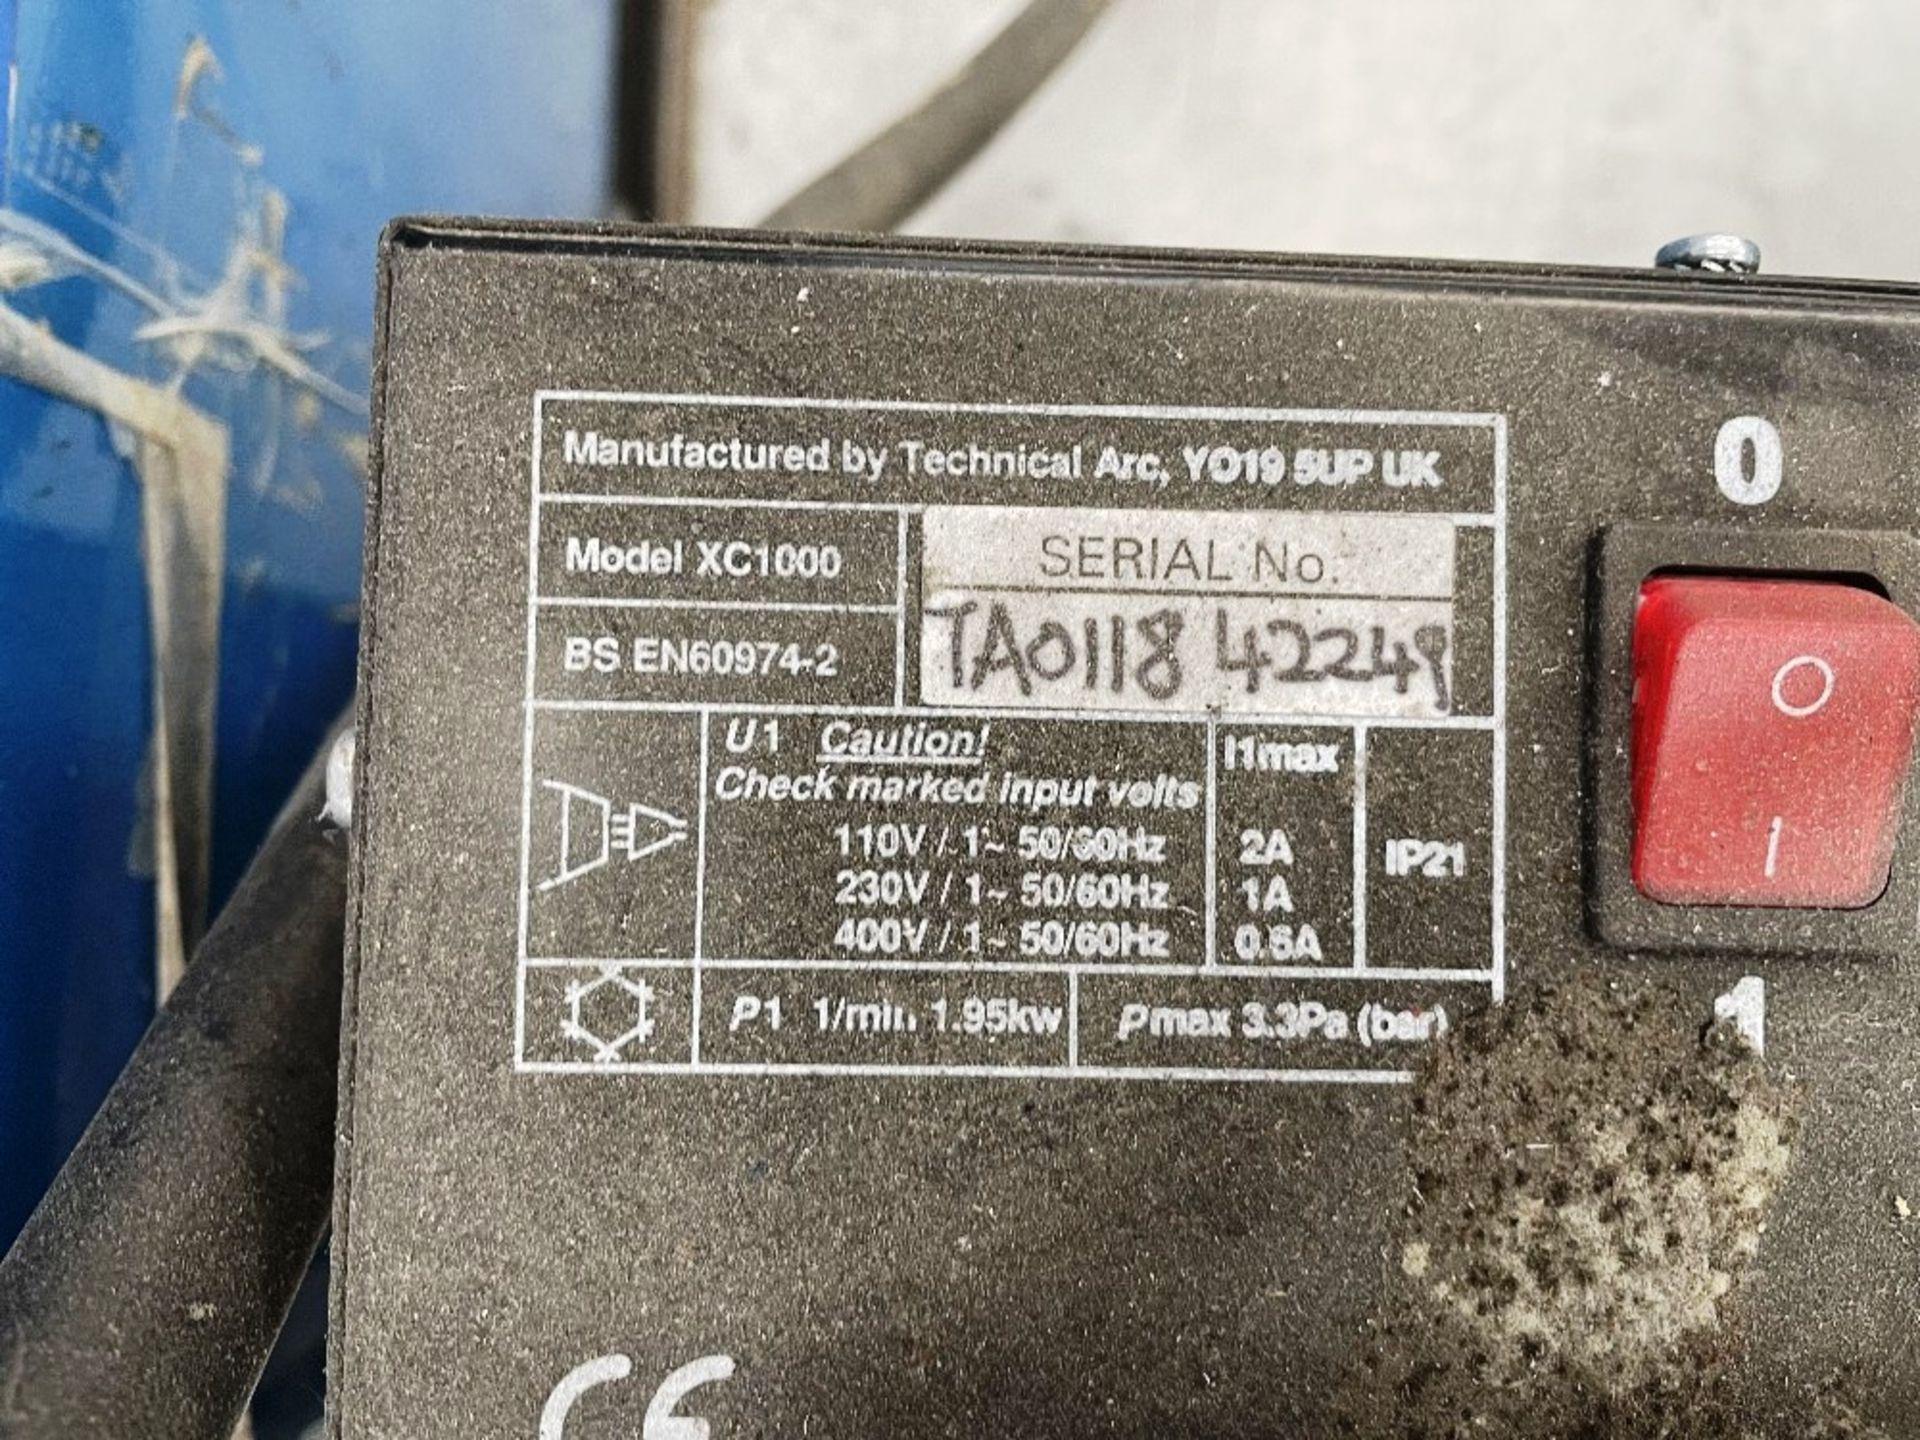 Miller Syncrowave 250 Tig Welder w/ TecArc XC1000 Water Cooler - Image 4 of 6